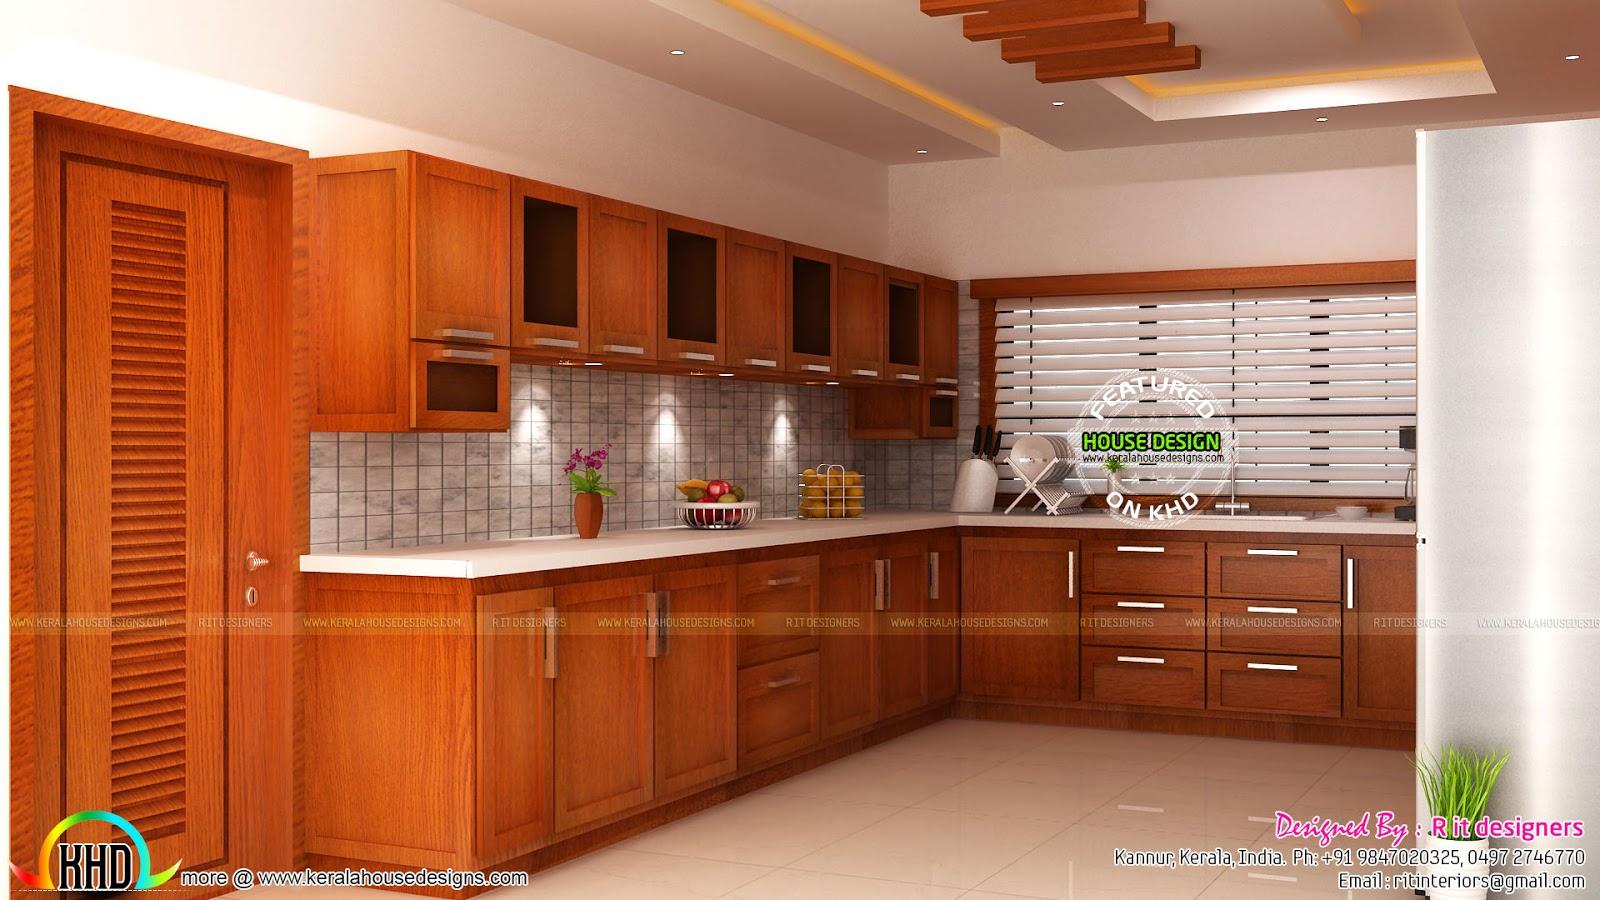 modular kitchen interior kerala kitchen interiors modular kitchens chennai chennai interior